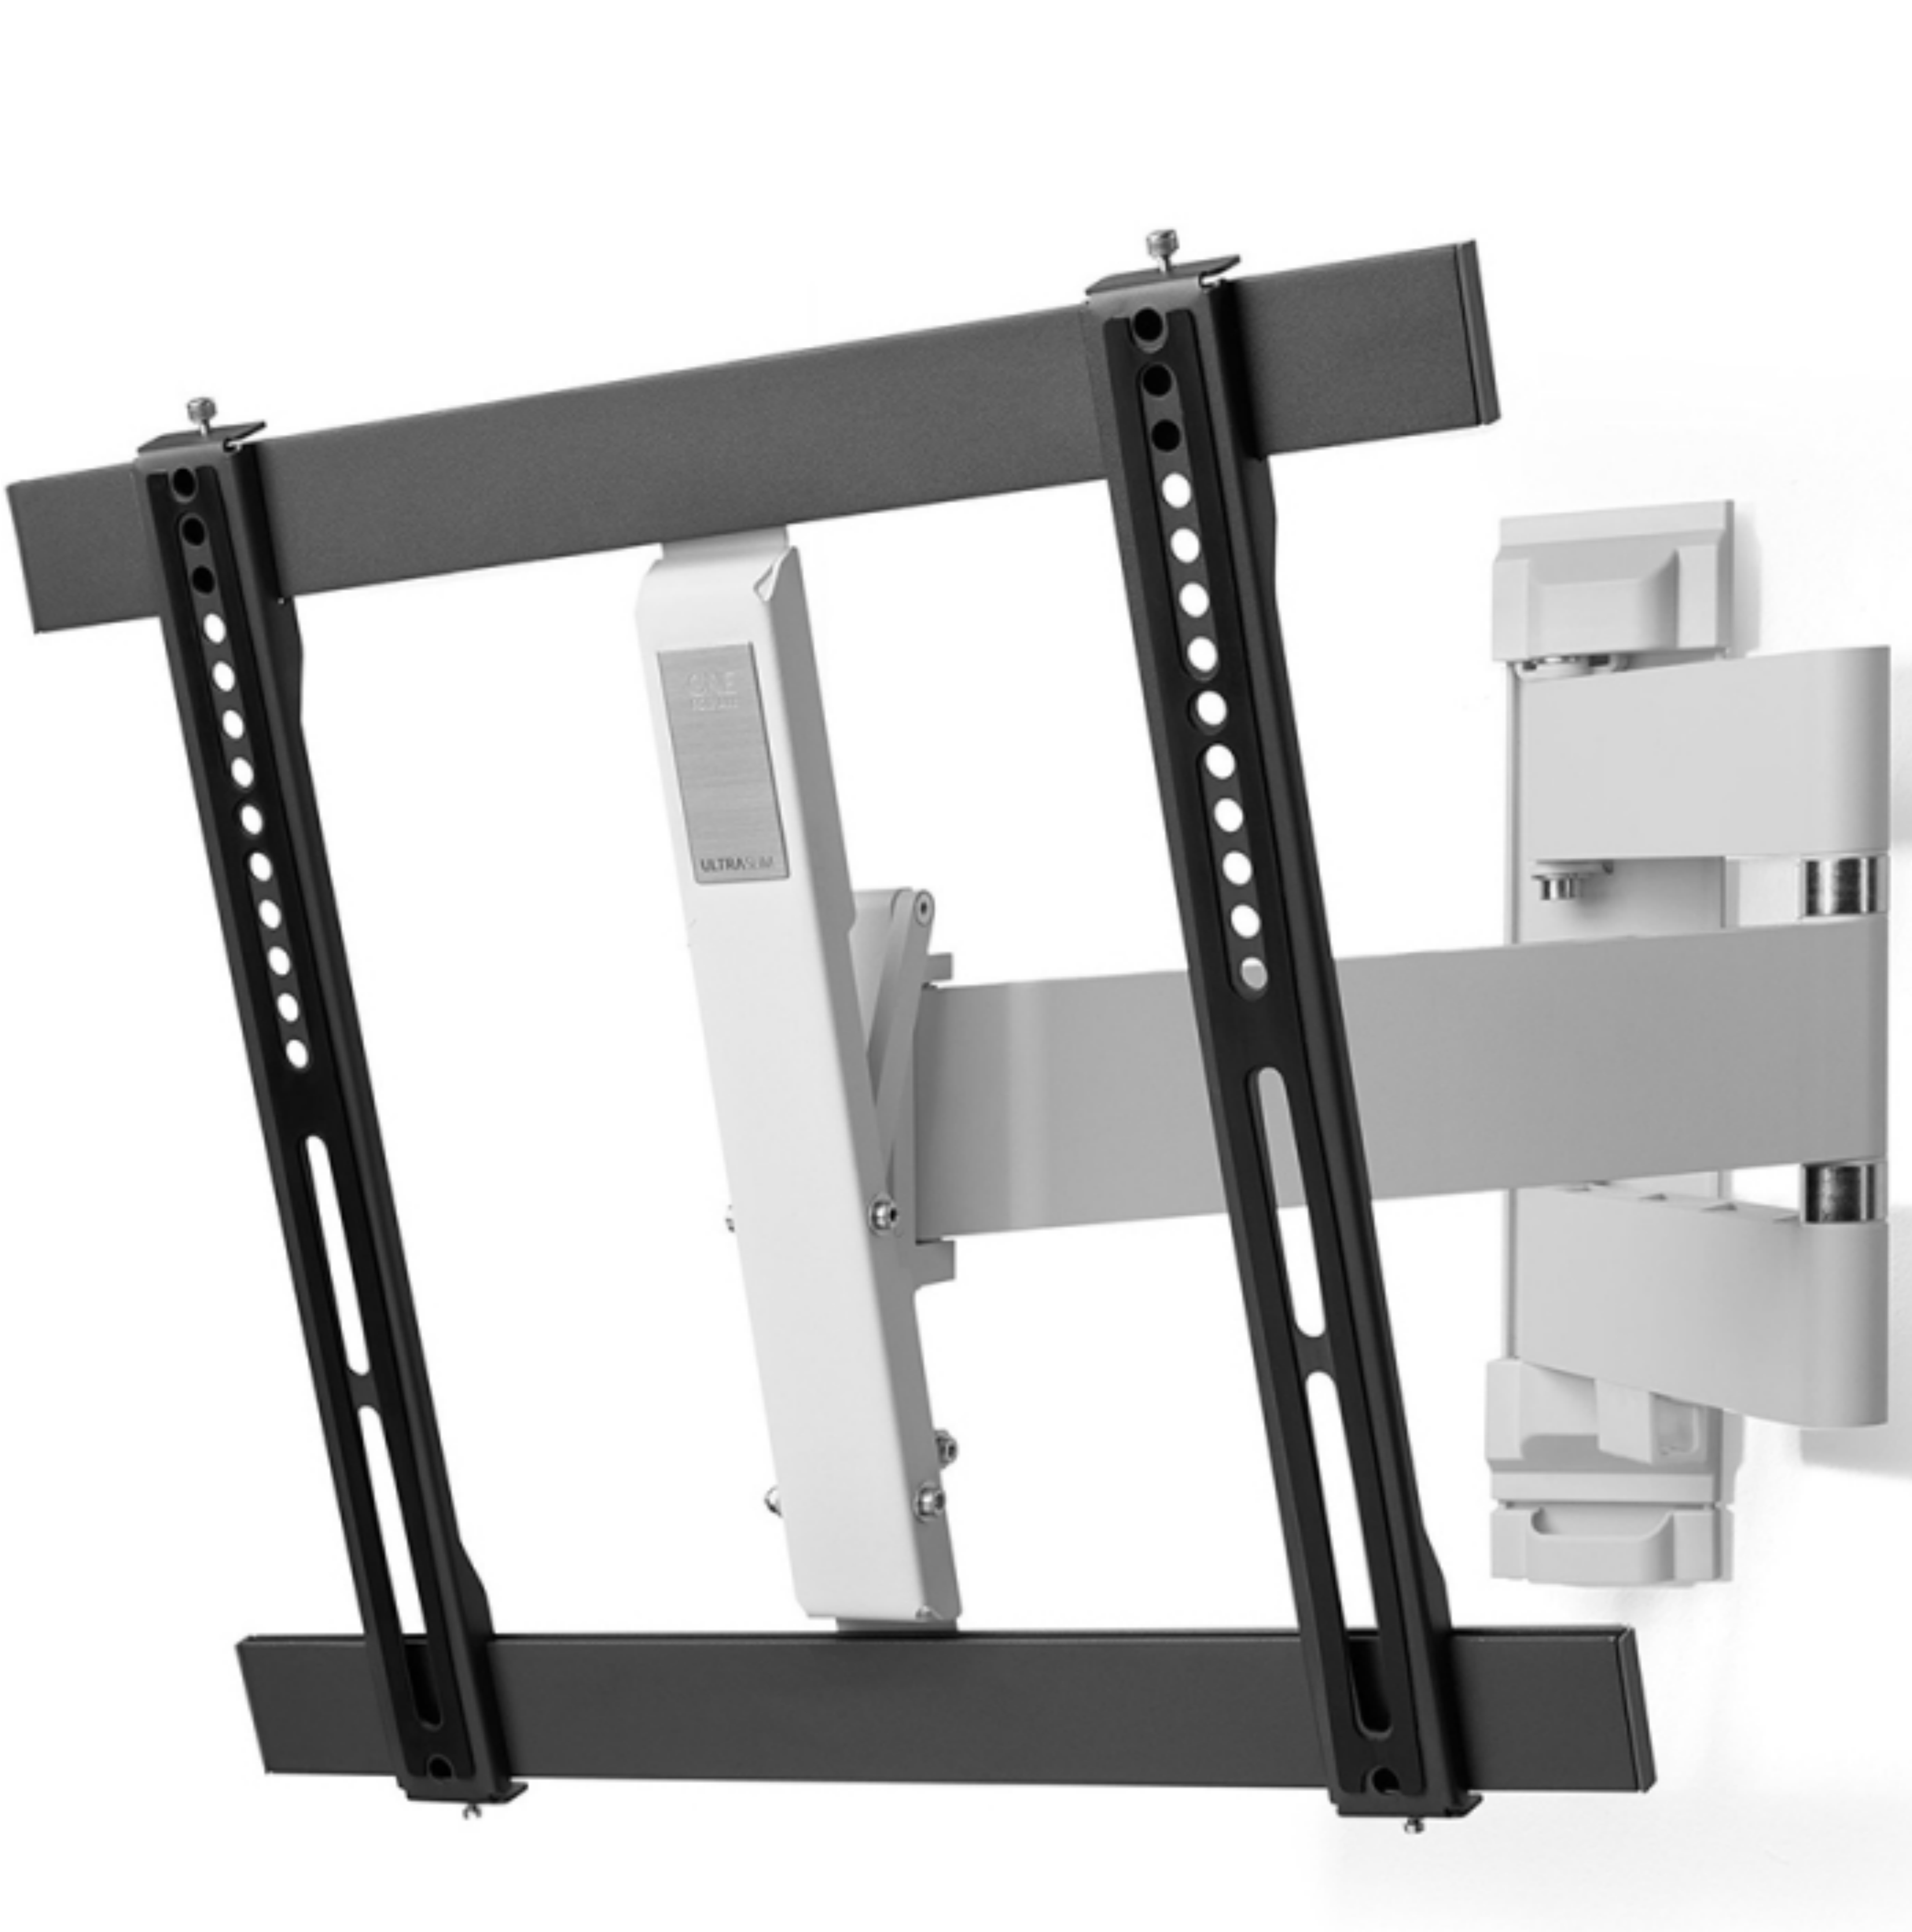 One For All WM6451|TV Bracket|Wall Mount|32-60 inch|Turn 180|Ultra Slim Series|